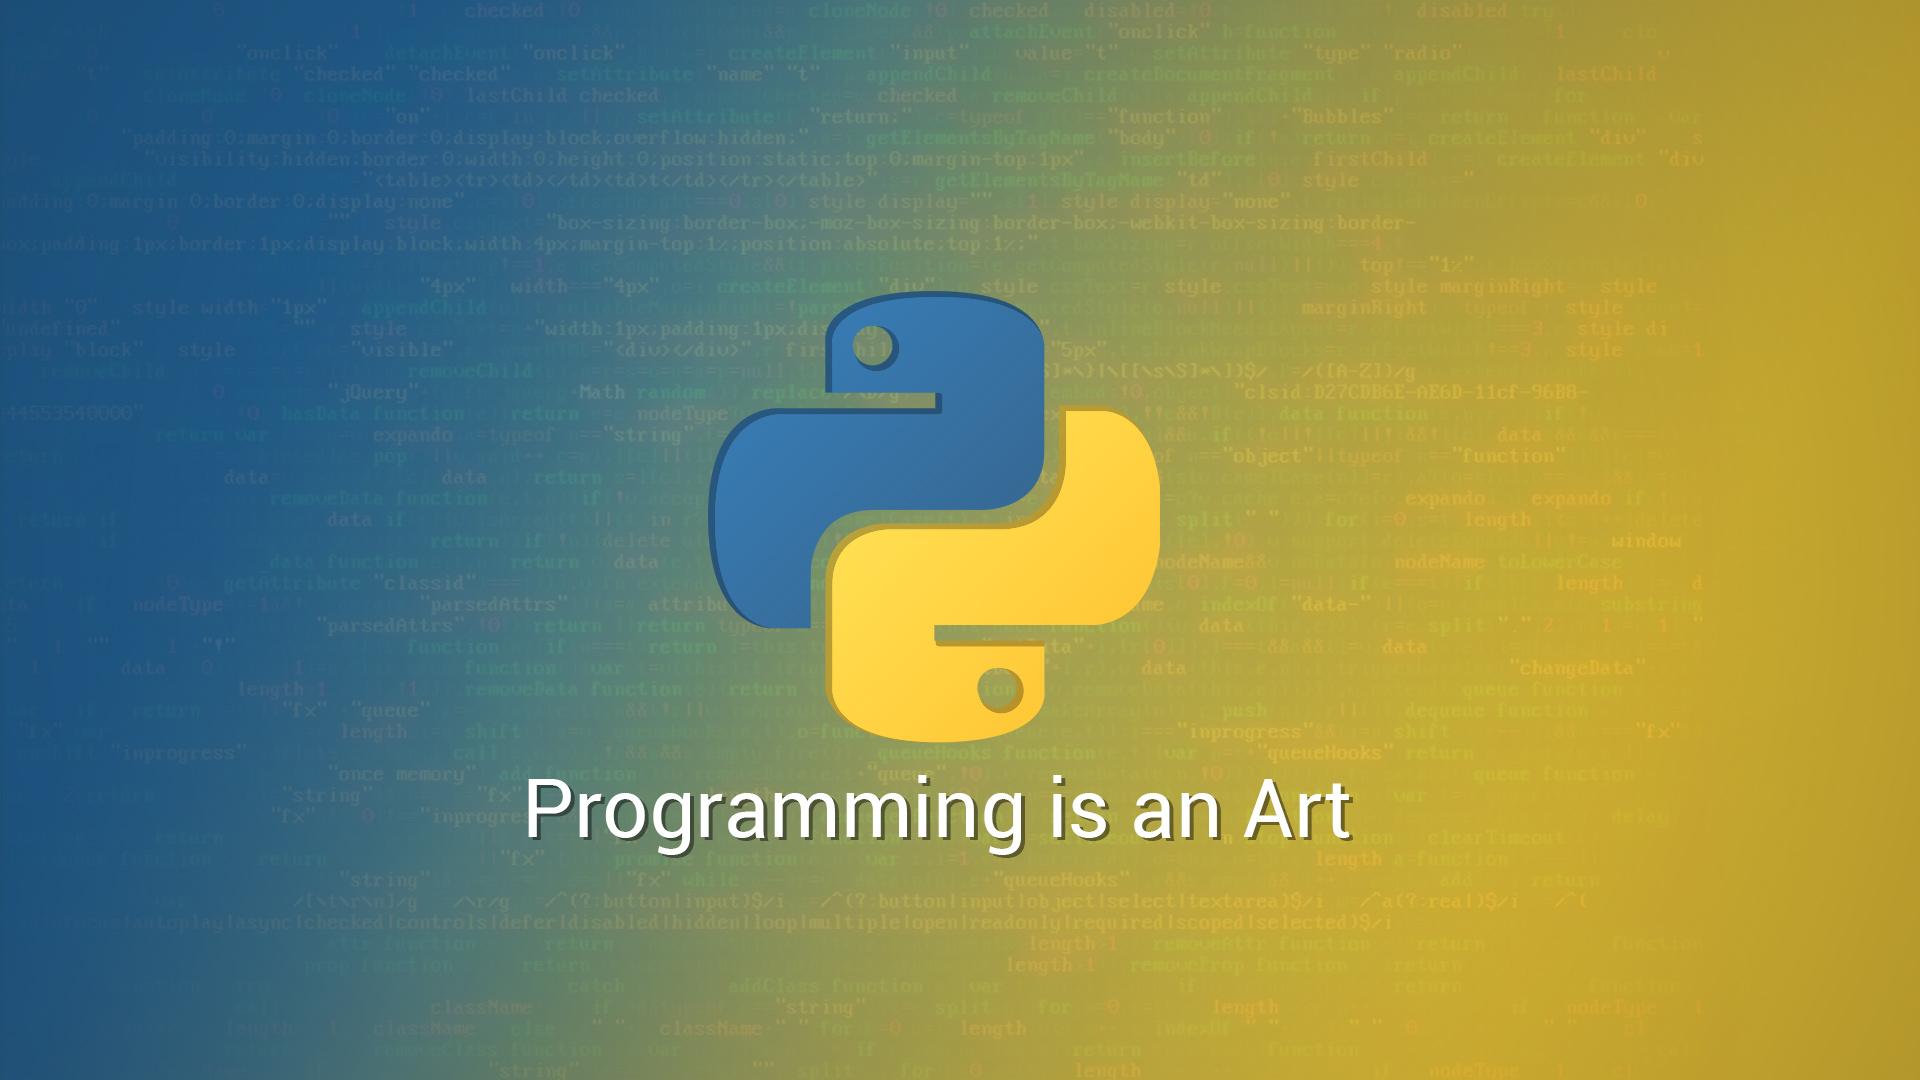 Programming Cute Wallpaper 2048x1152 Python 2048x1152 Resolution Hd 4k Wallpapers